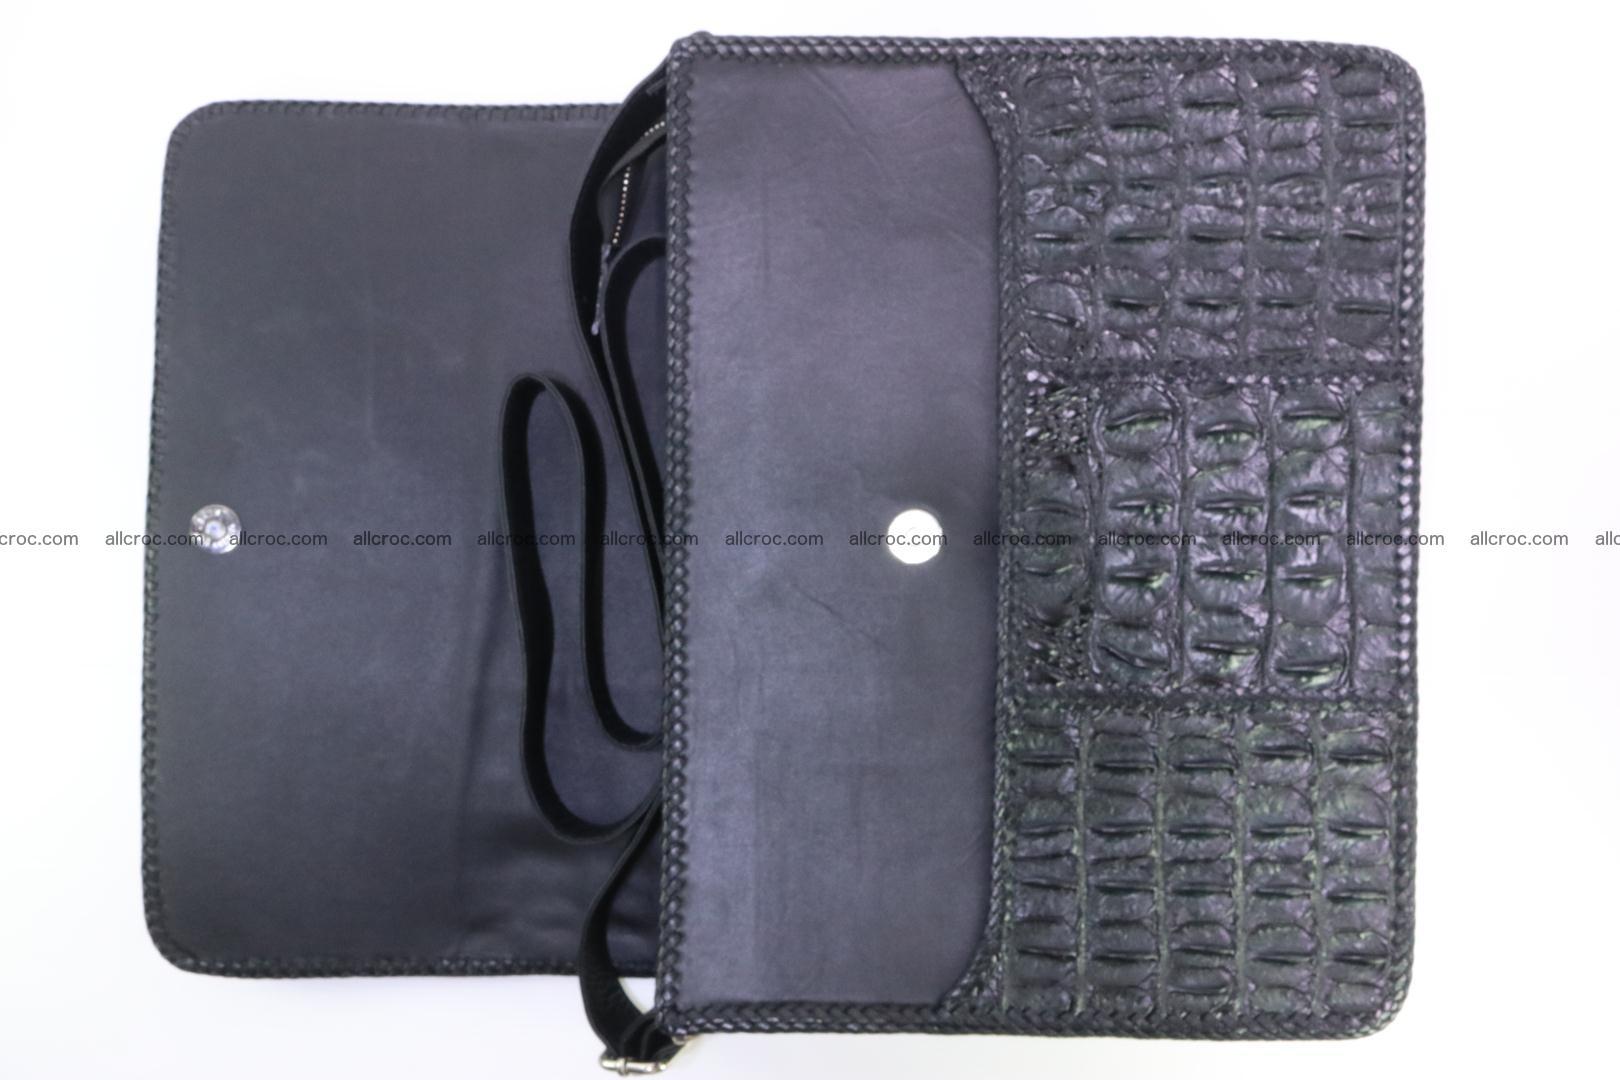 Crocodile skin shoulder bag with braided edges 147 Foto 4